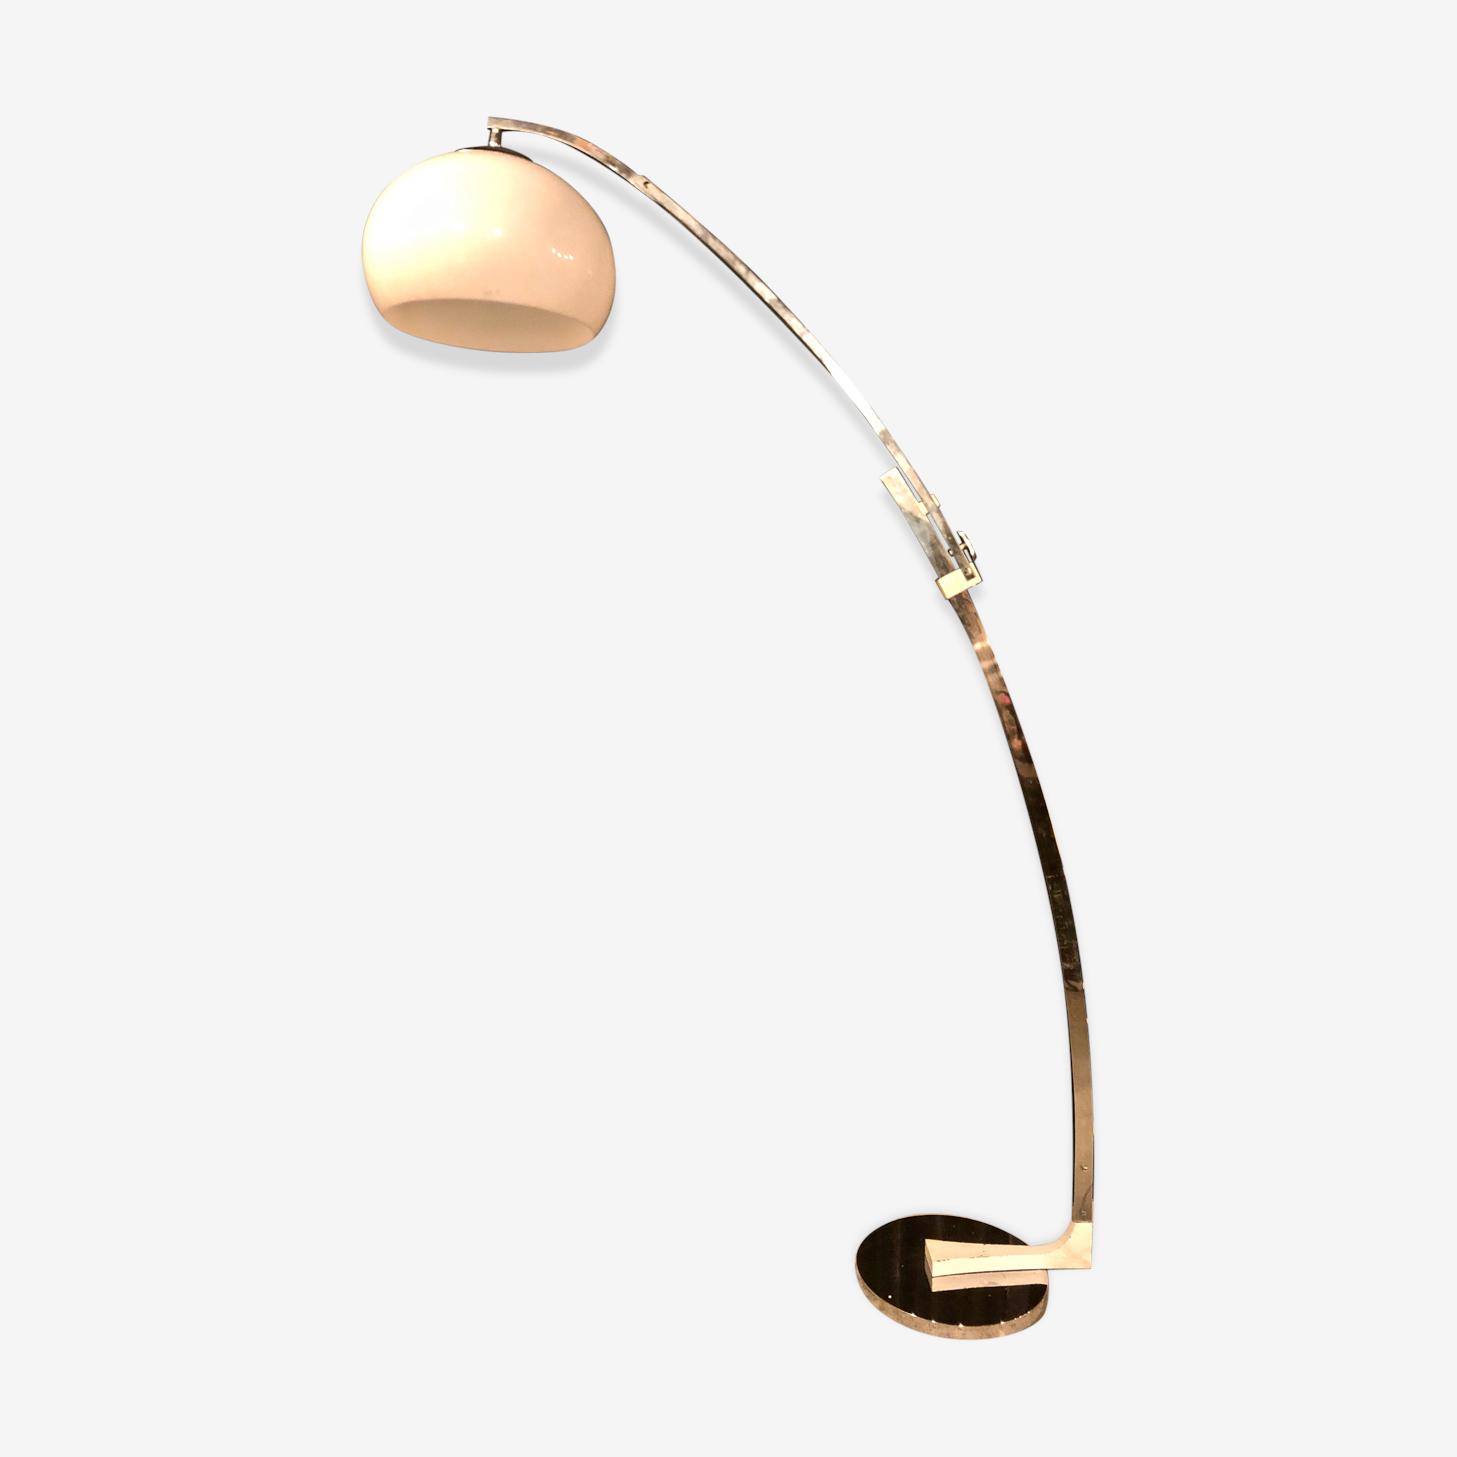 Goffredo Reggiani arc floor lamp